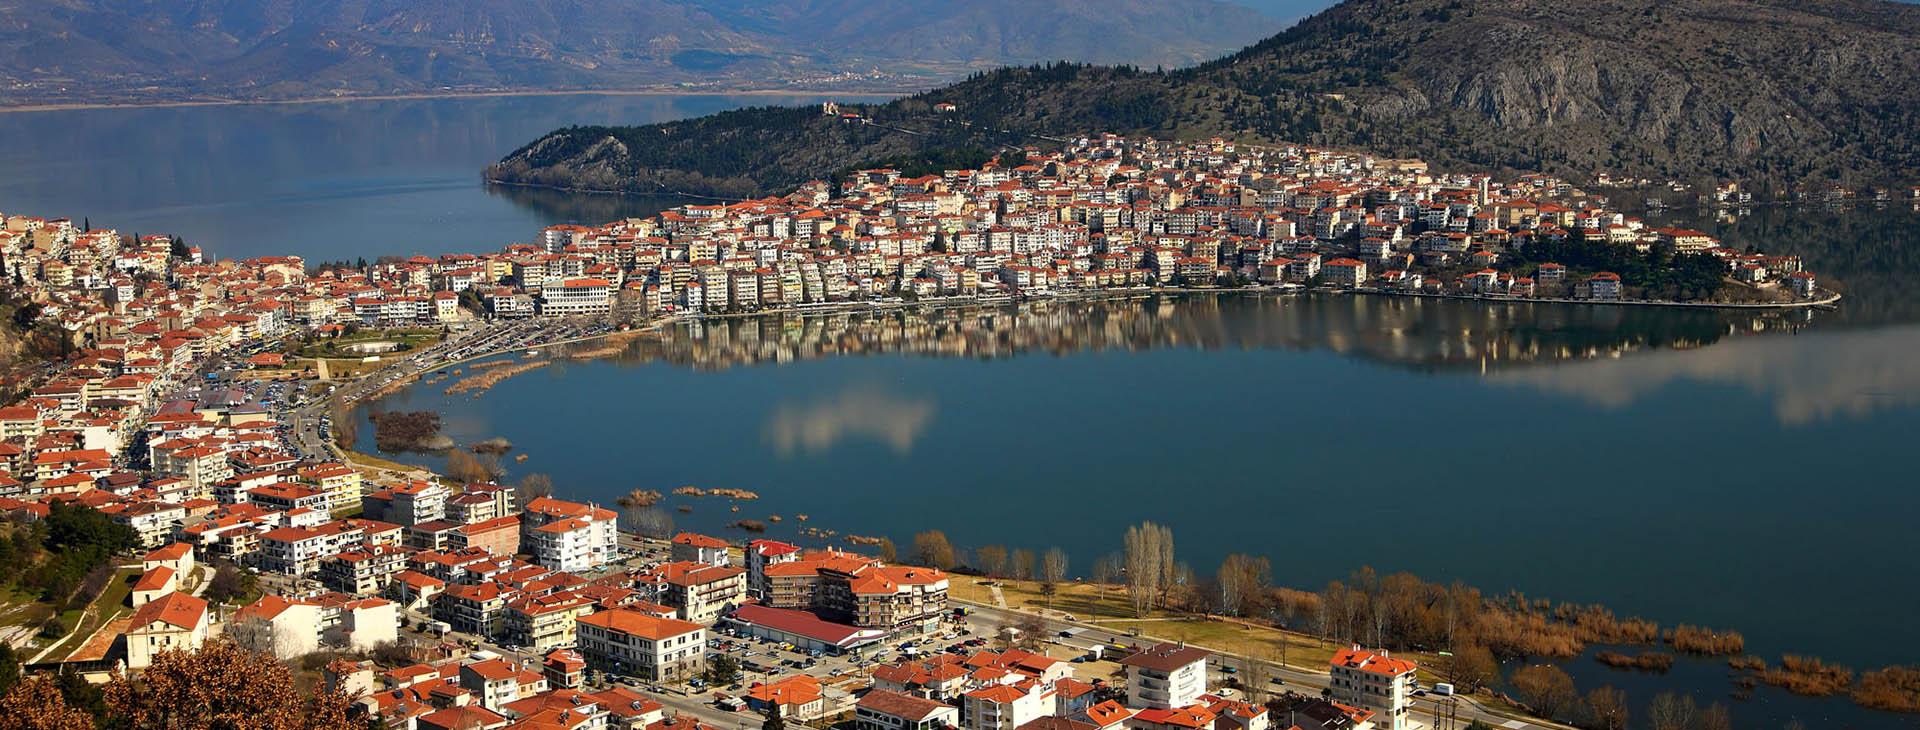 Kastoria town and lake